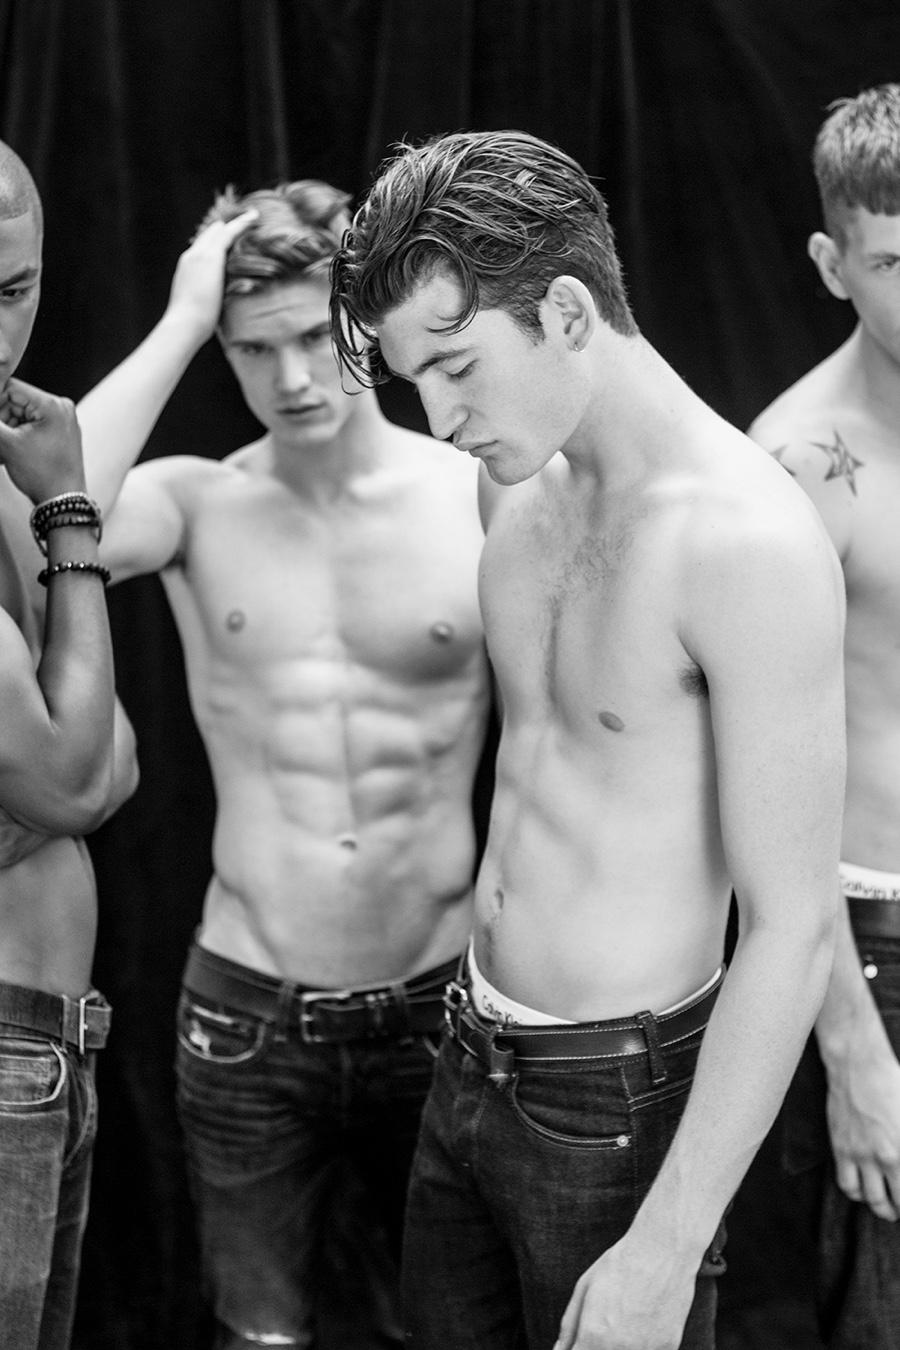 Boys of Summer: Q Models by Gregory Prescott   The Fashionisto